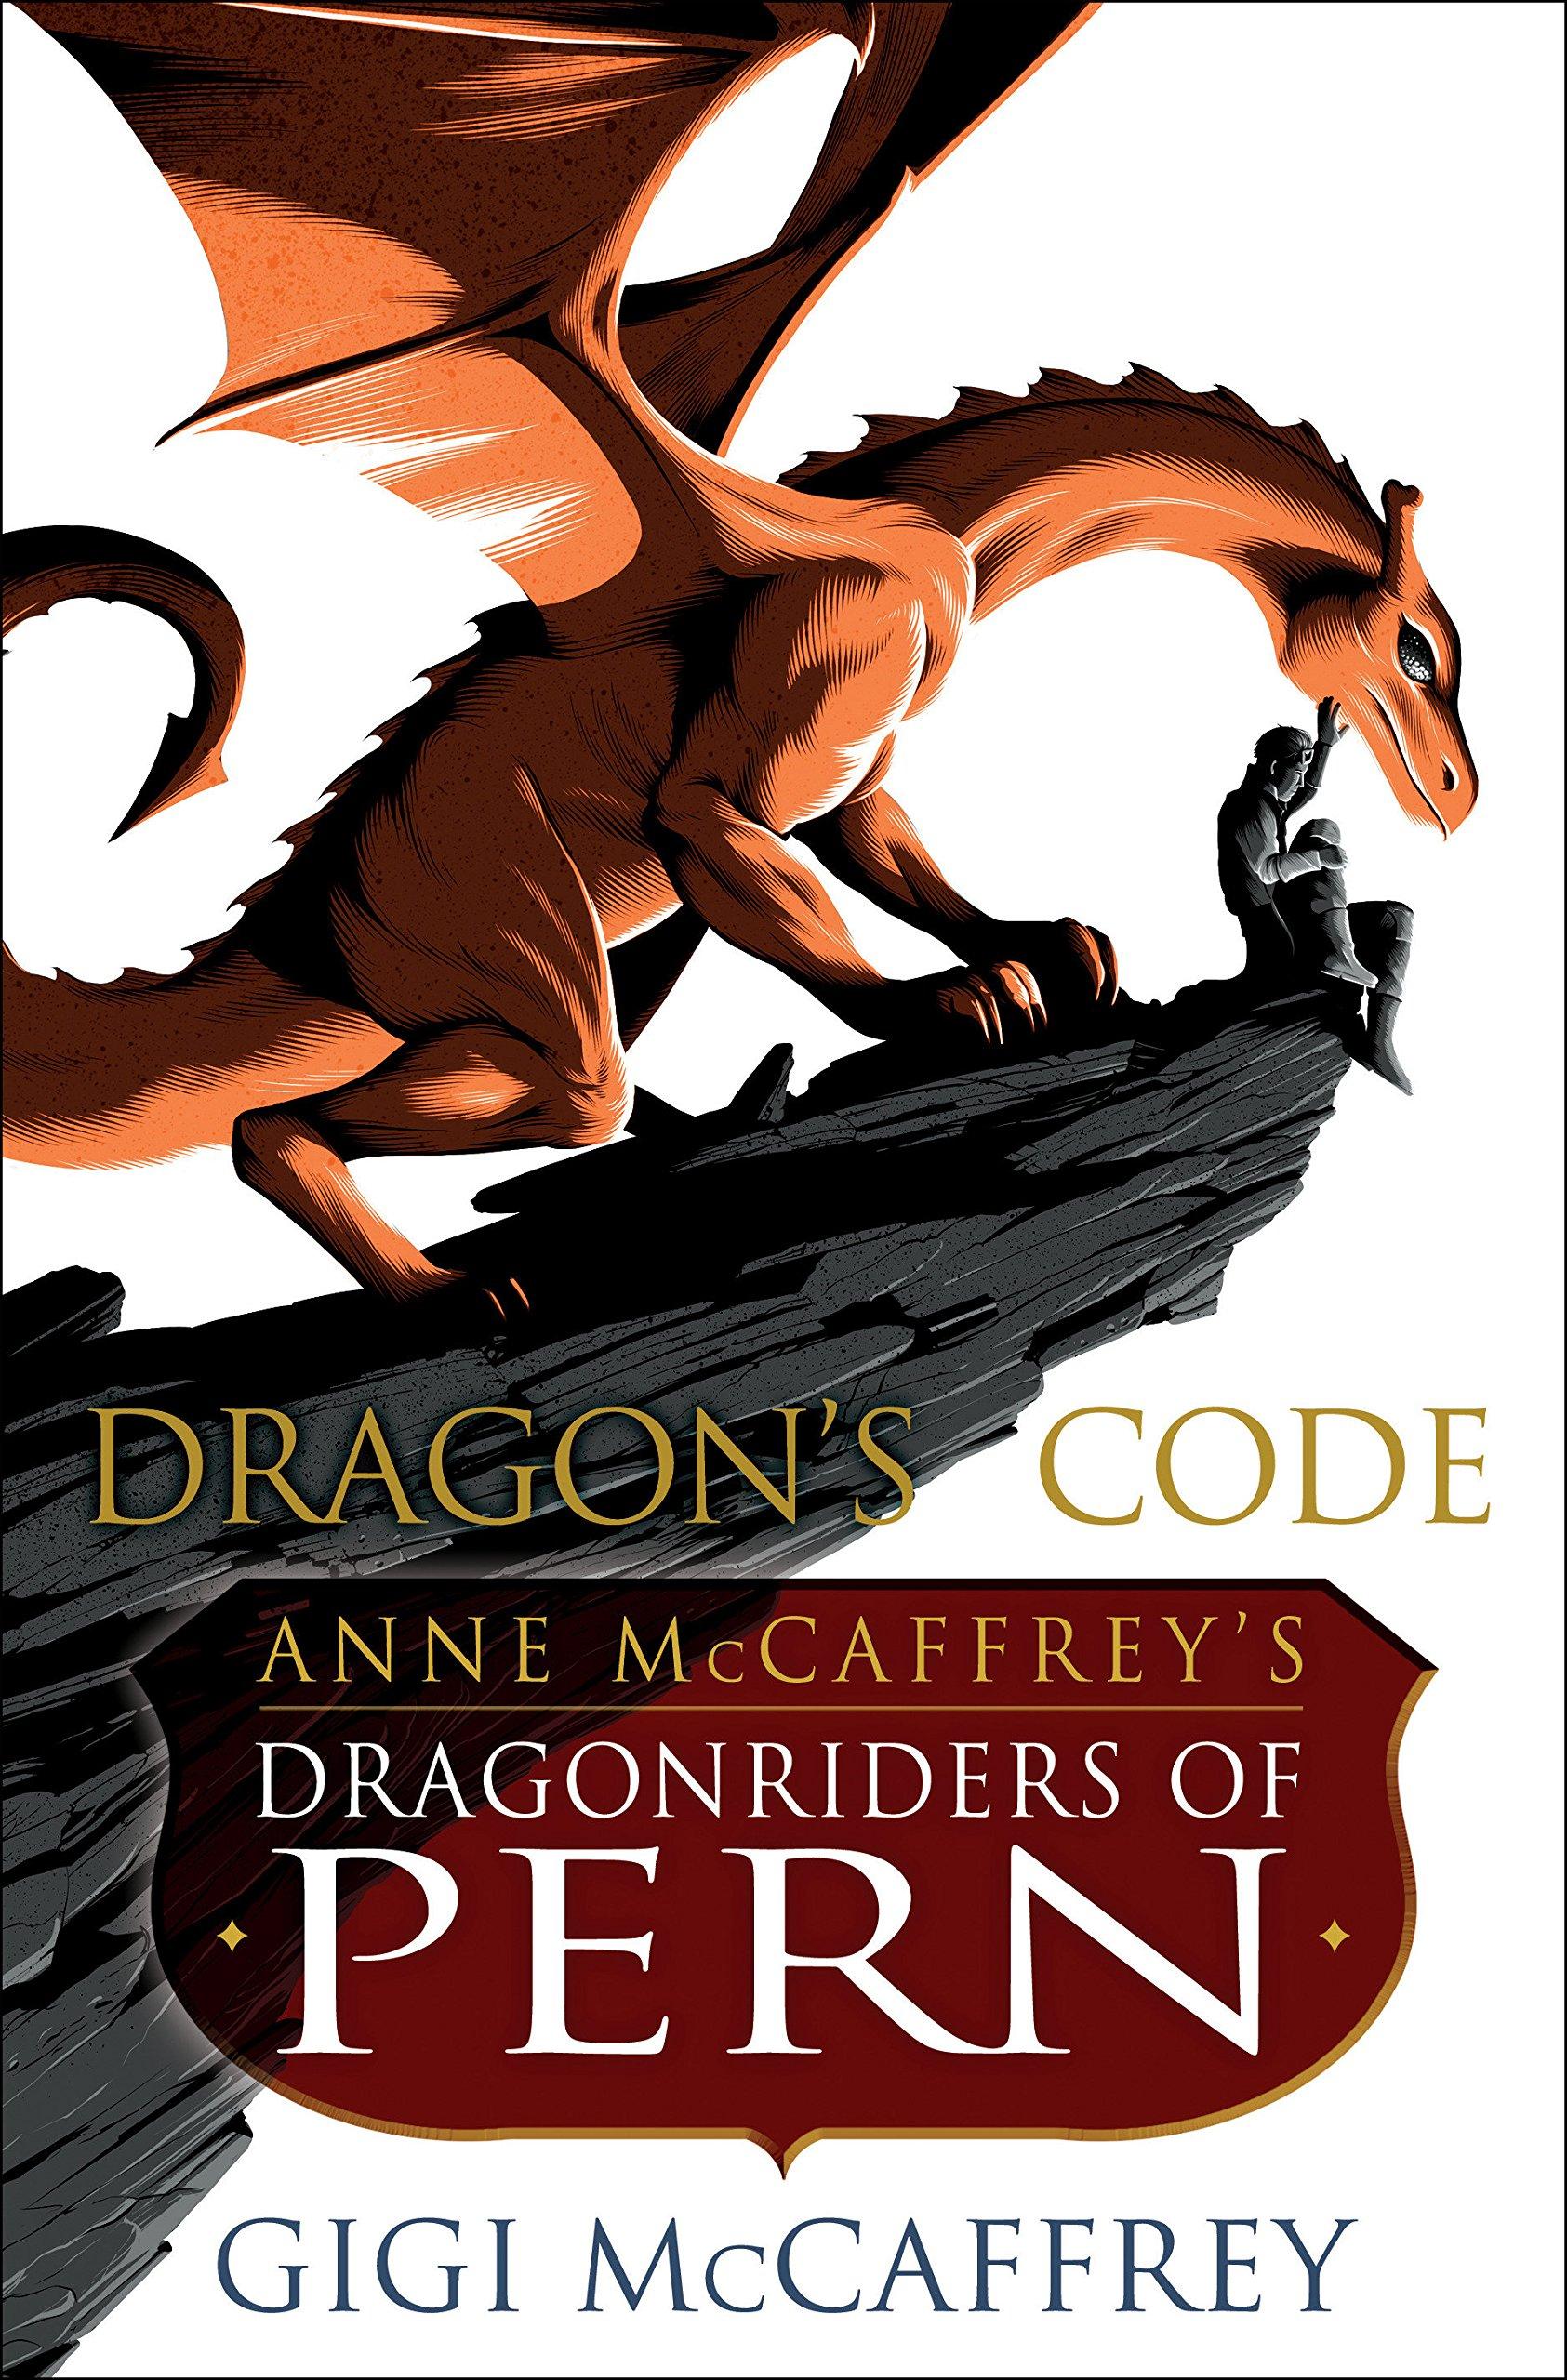 Amazon.com: Dragon's Code: Anne McCaffrey's Dragonriders of Pern (Pern: The  Dragonriders of Pern) (9781101964743): Gigi McCaffrey: Books